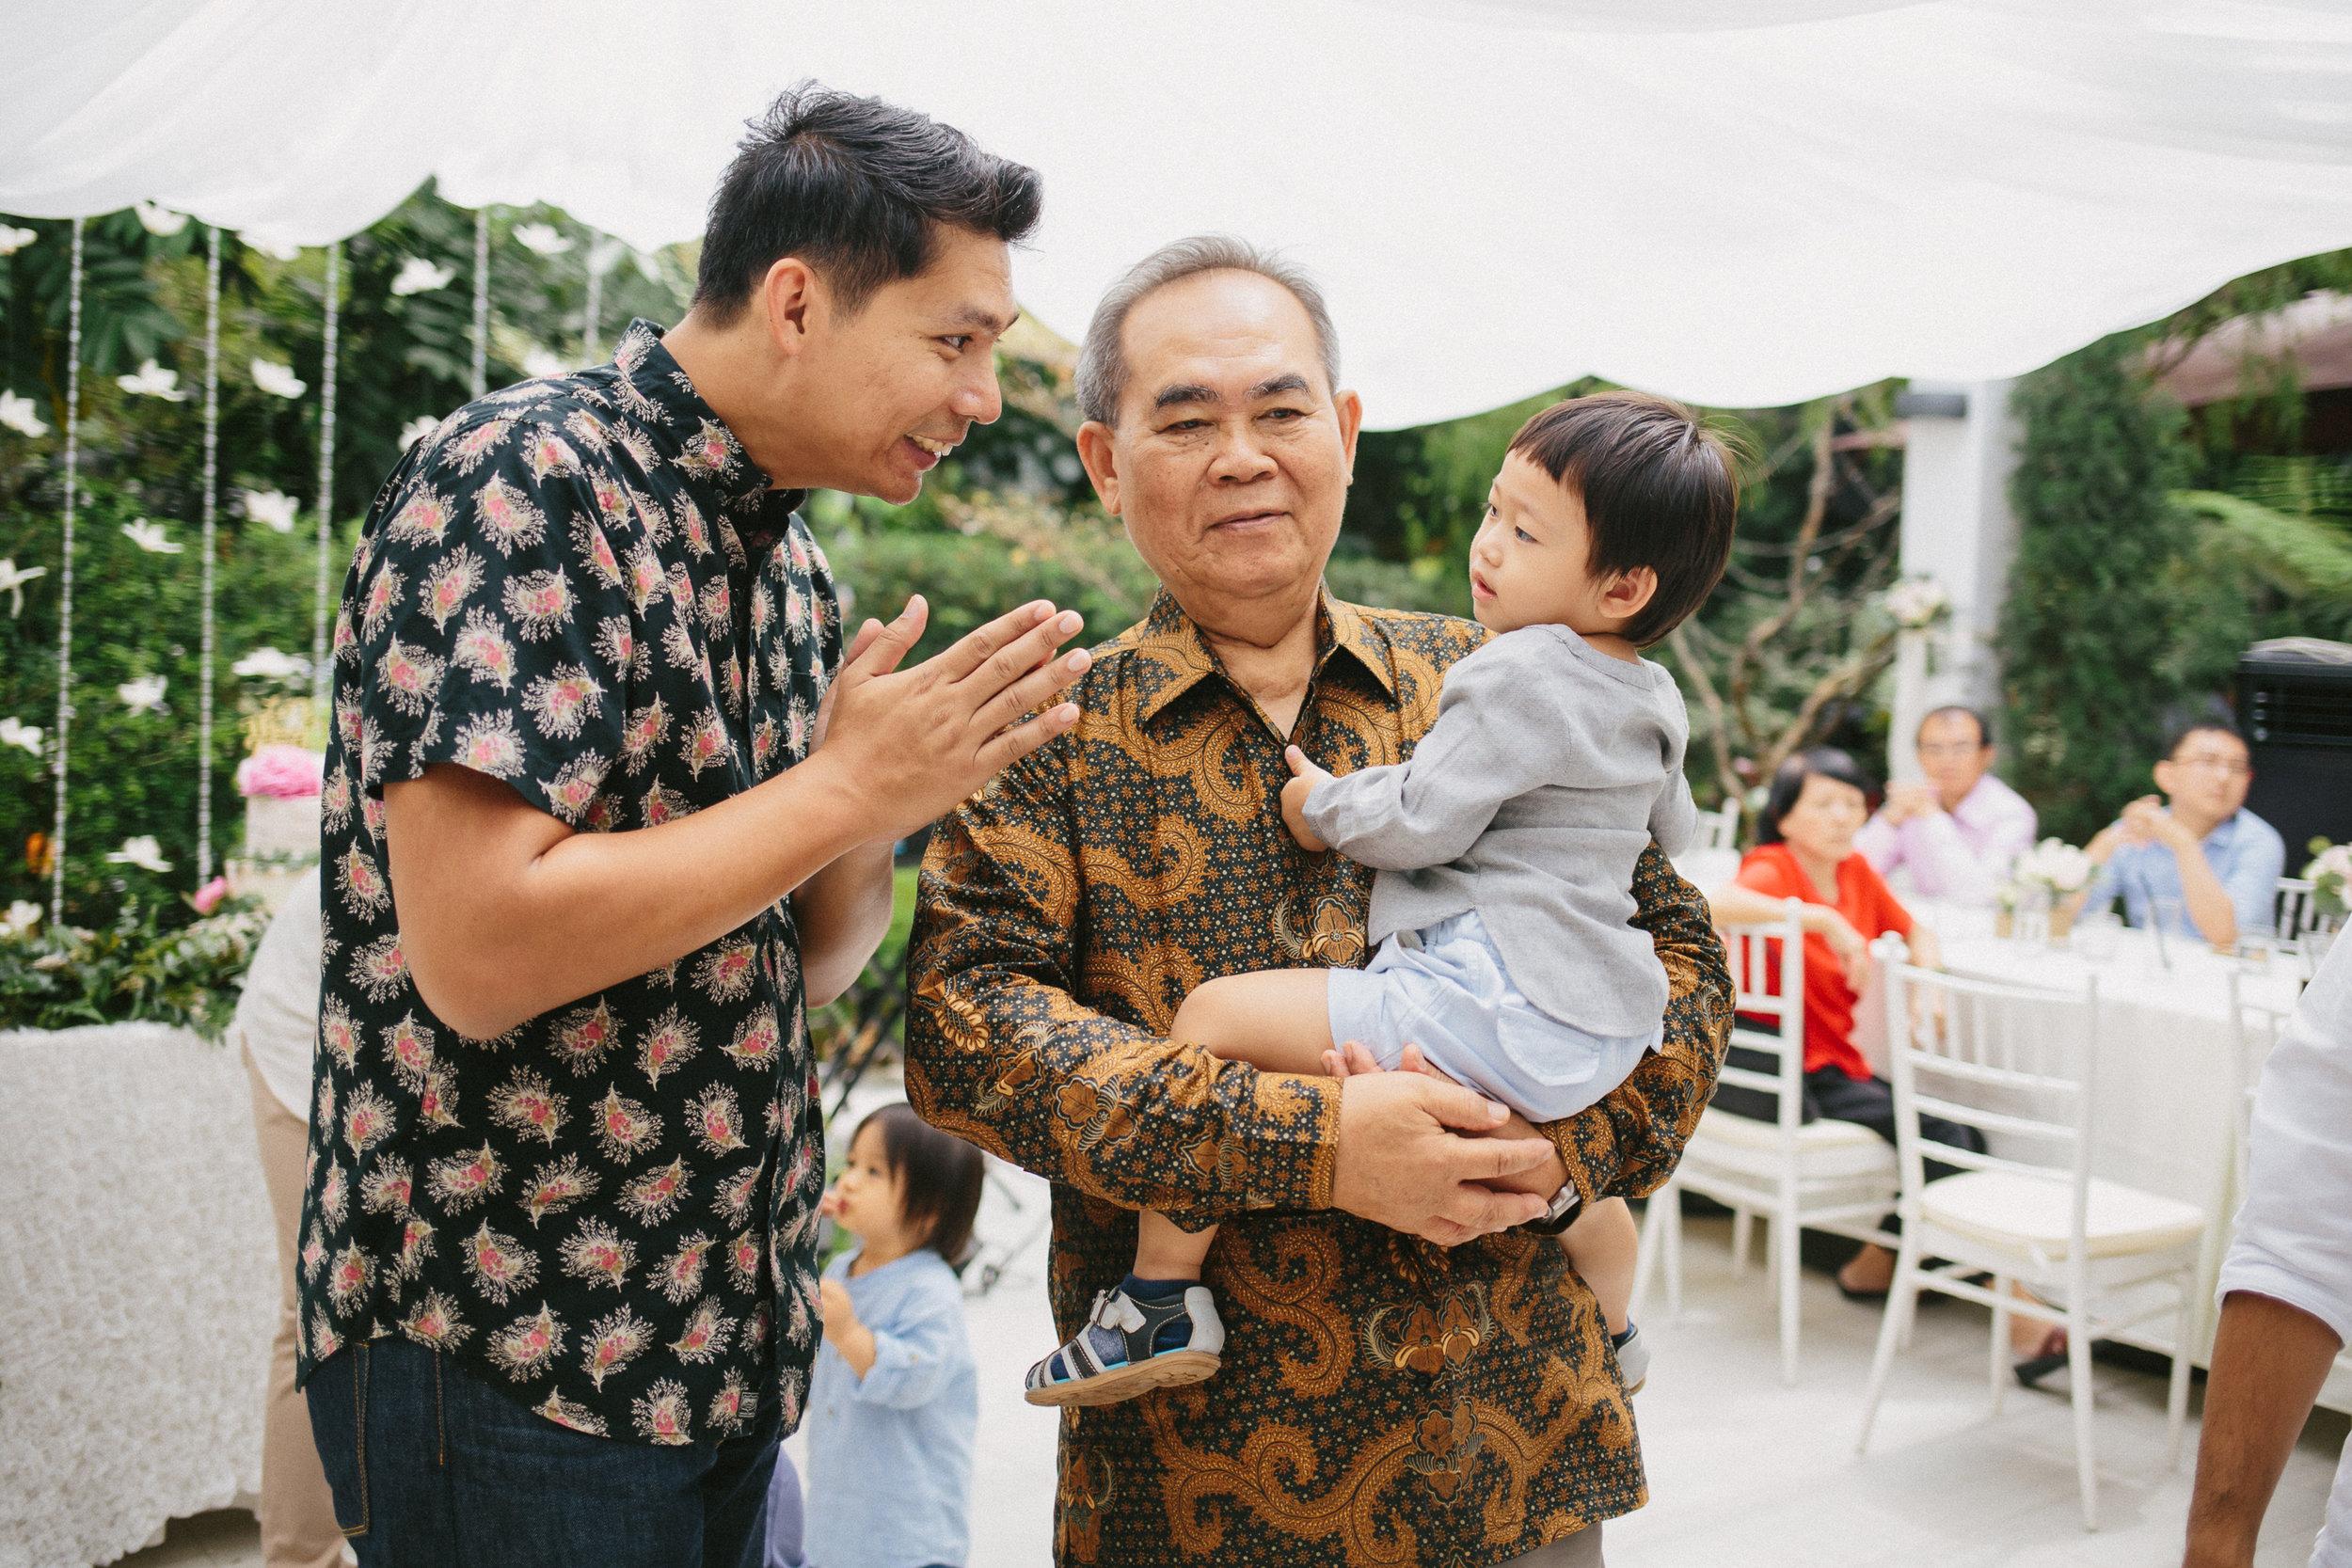 singapore-wedding-photographer-fadilah-kwan-053.jpg